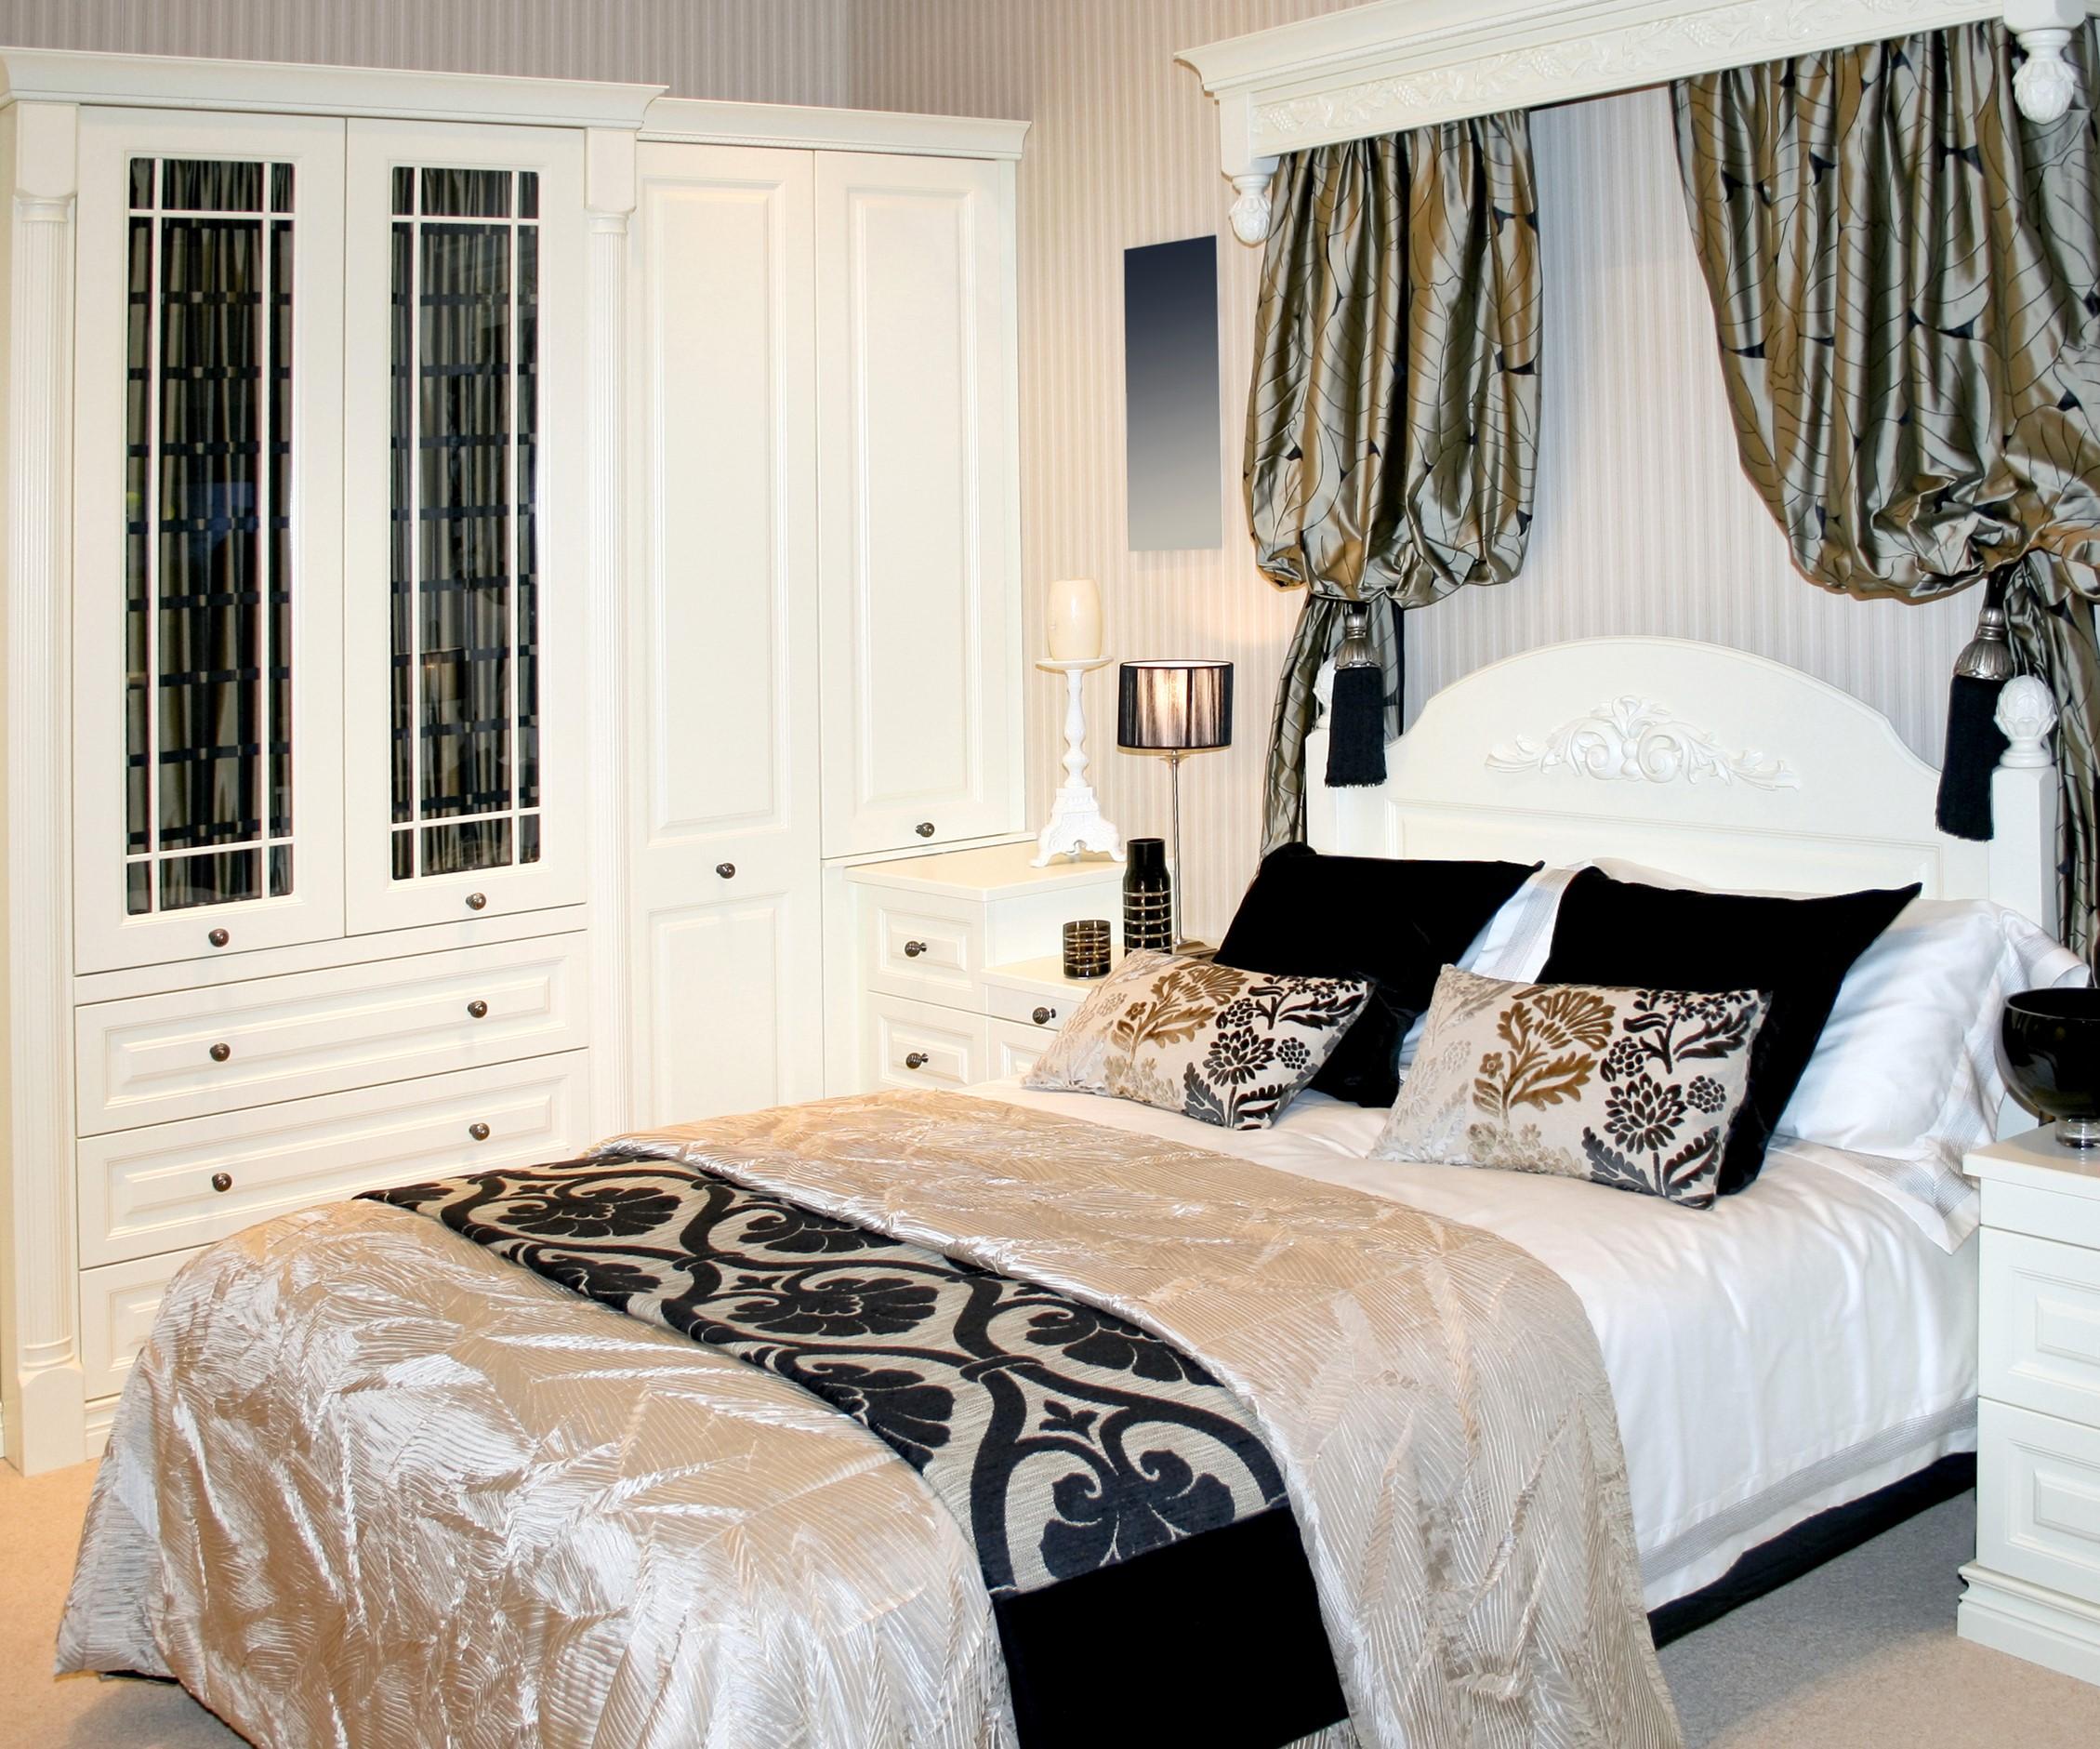 buy the best sheets shop bedding blog